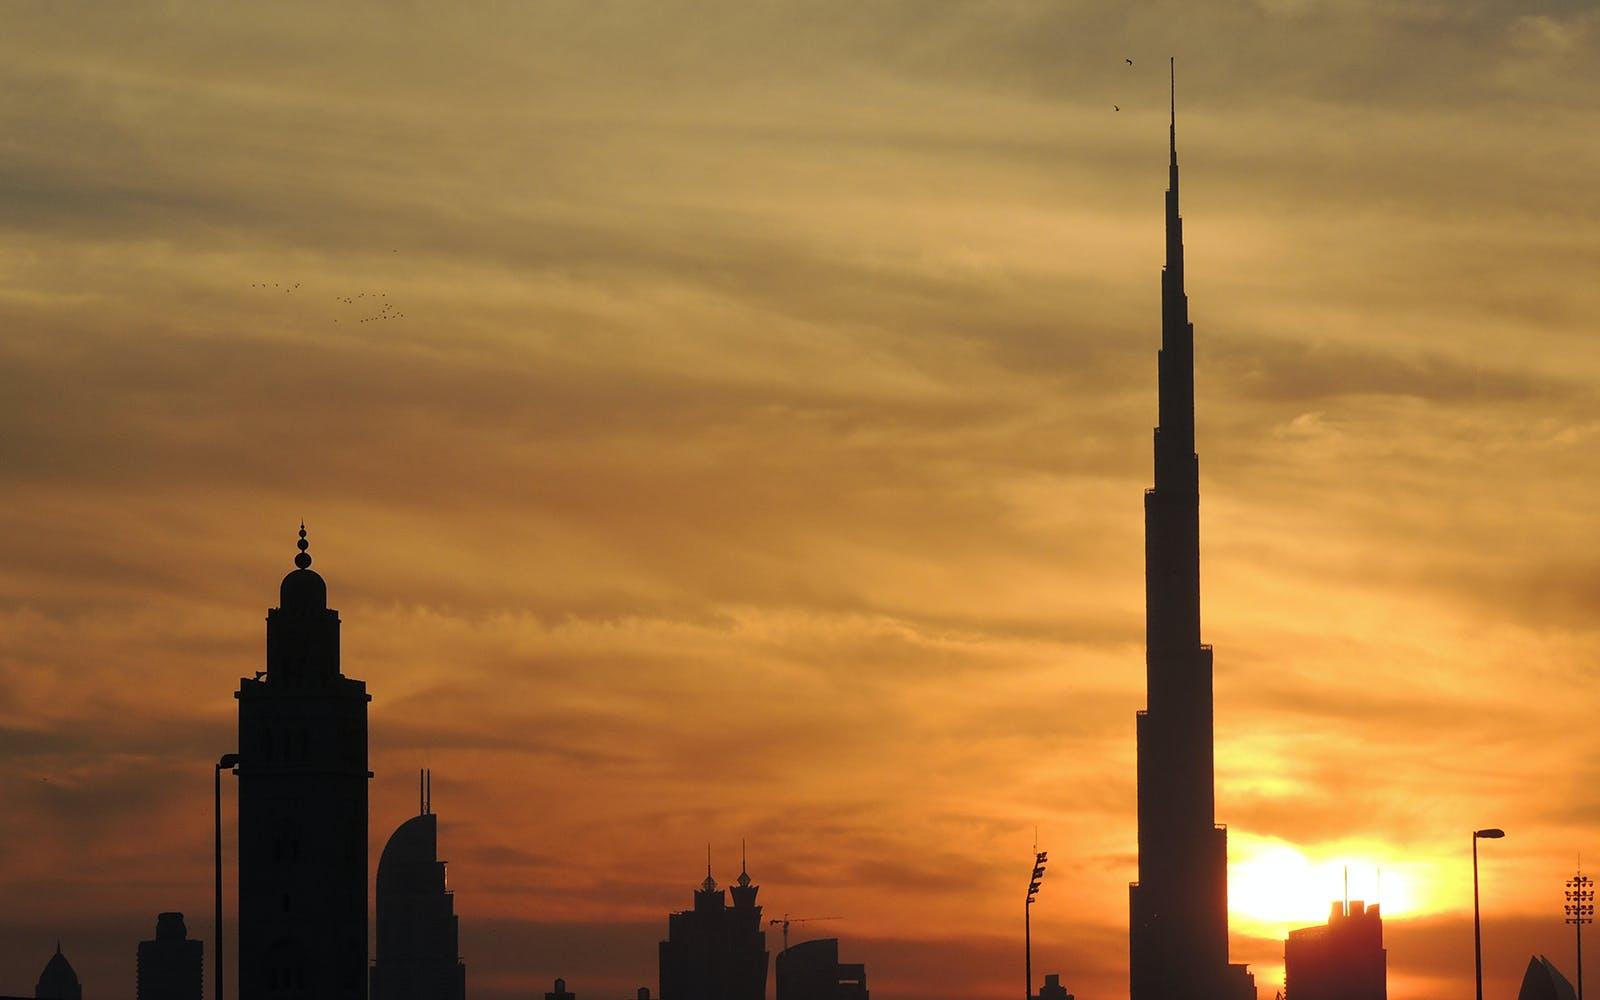 5 Day Dubai Itinerary - Burj Khalifa - 2